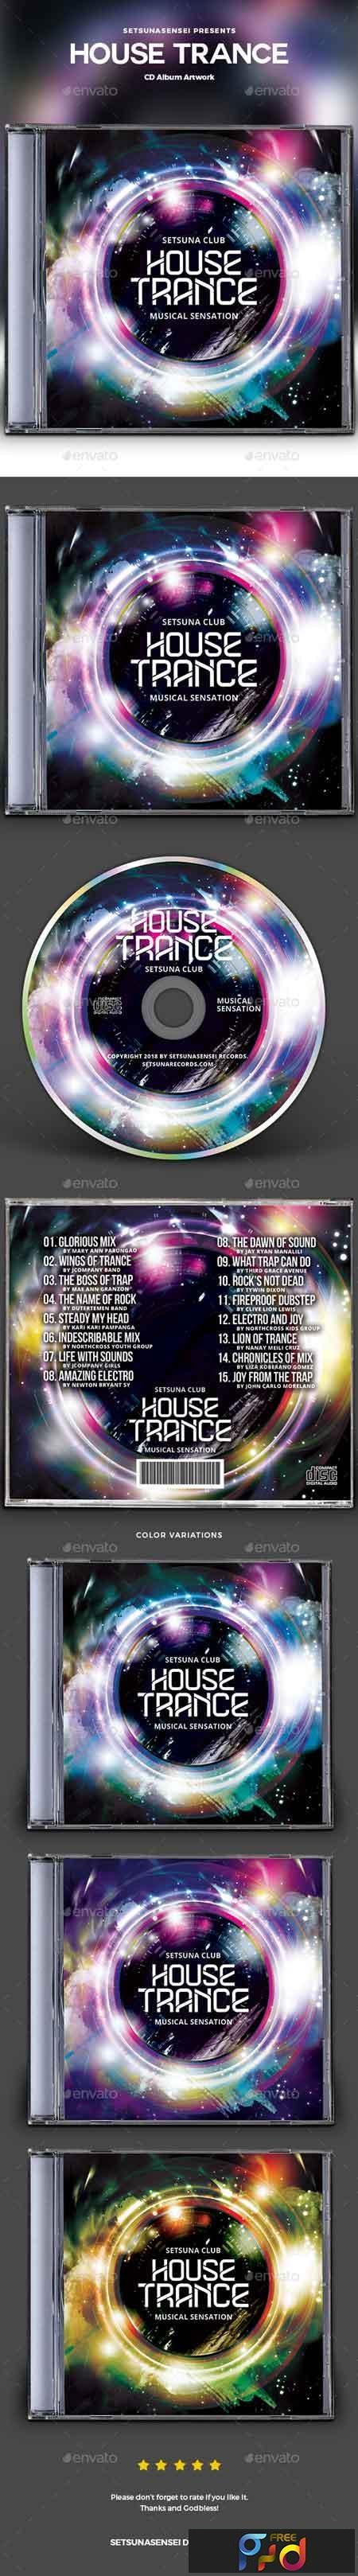 House Trance CD Album Artwork 22830517 1